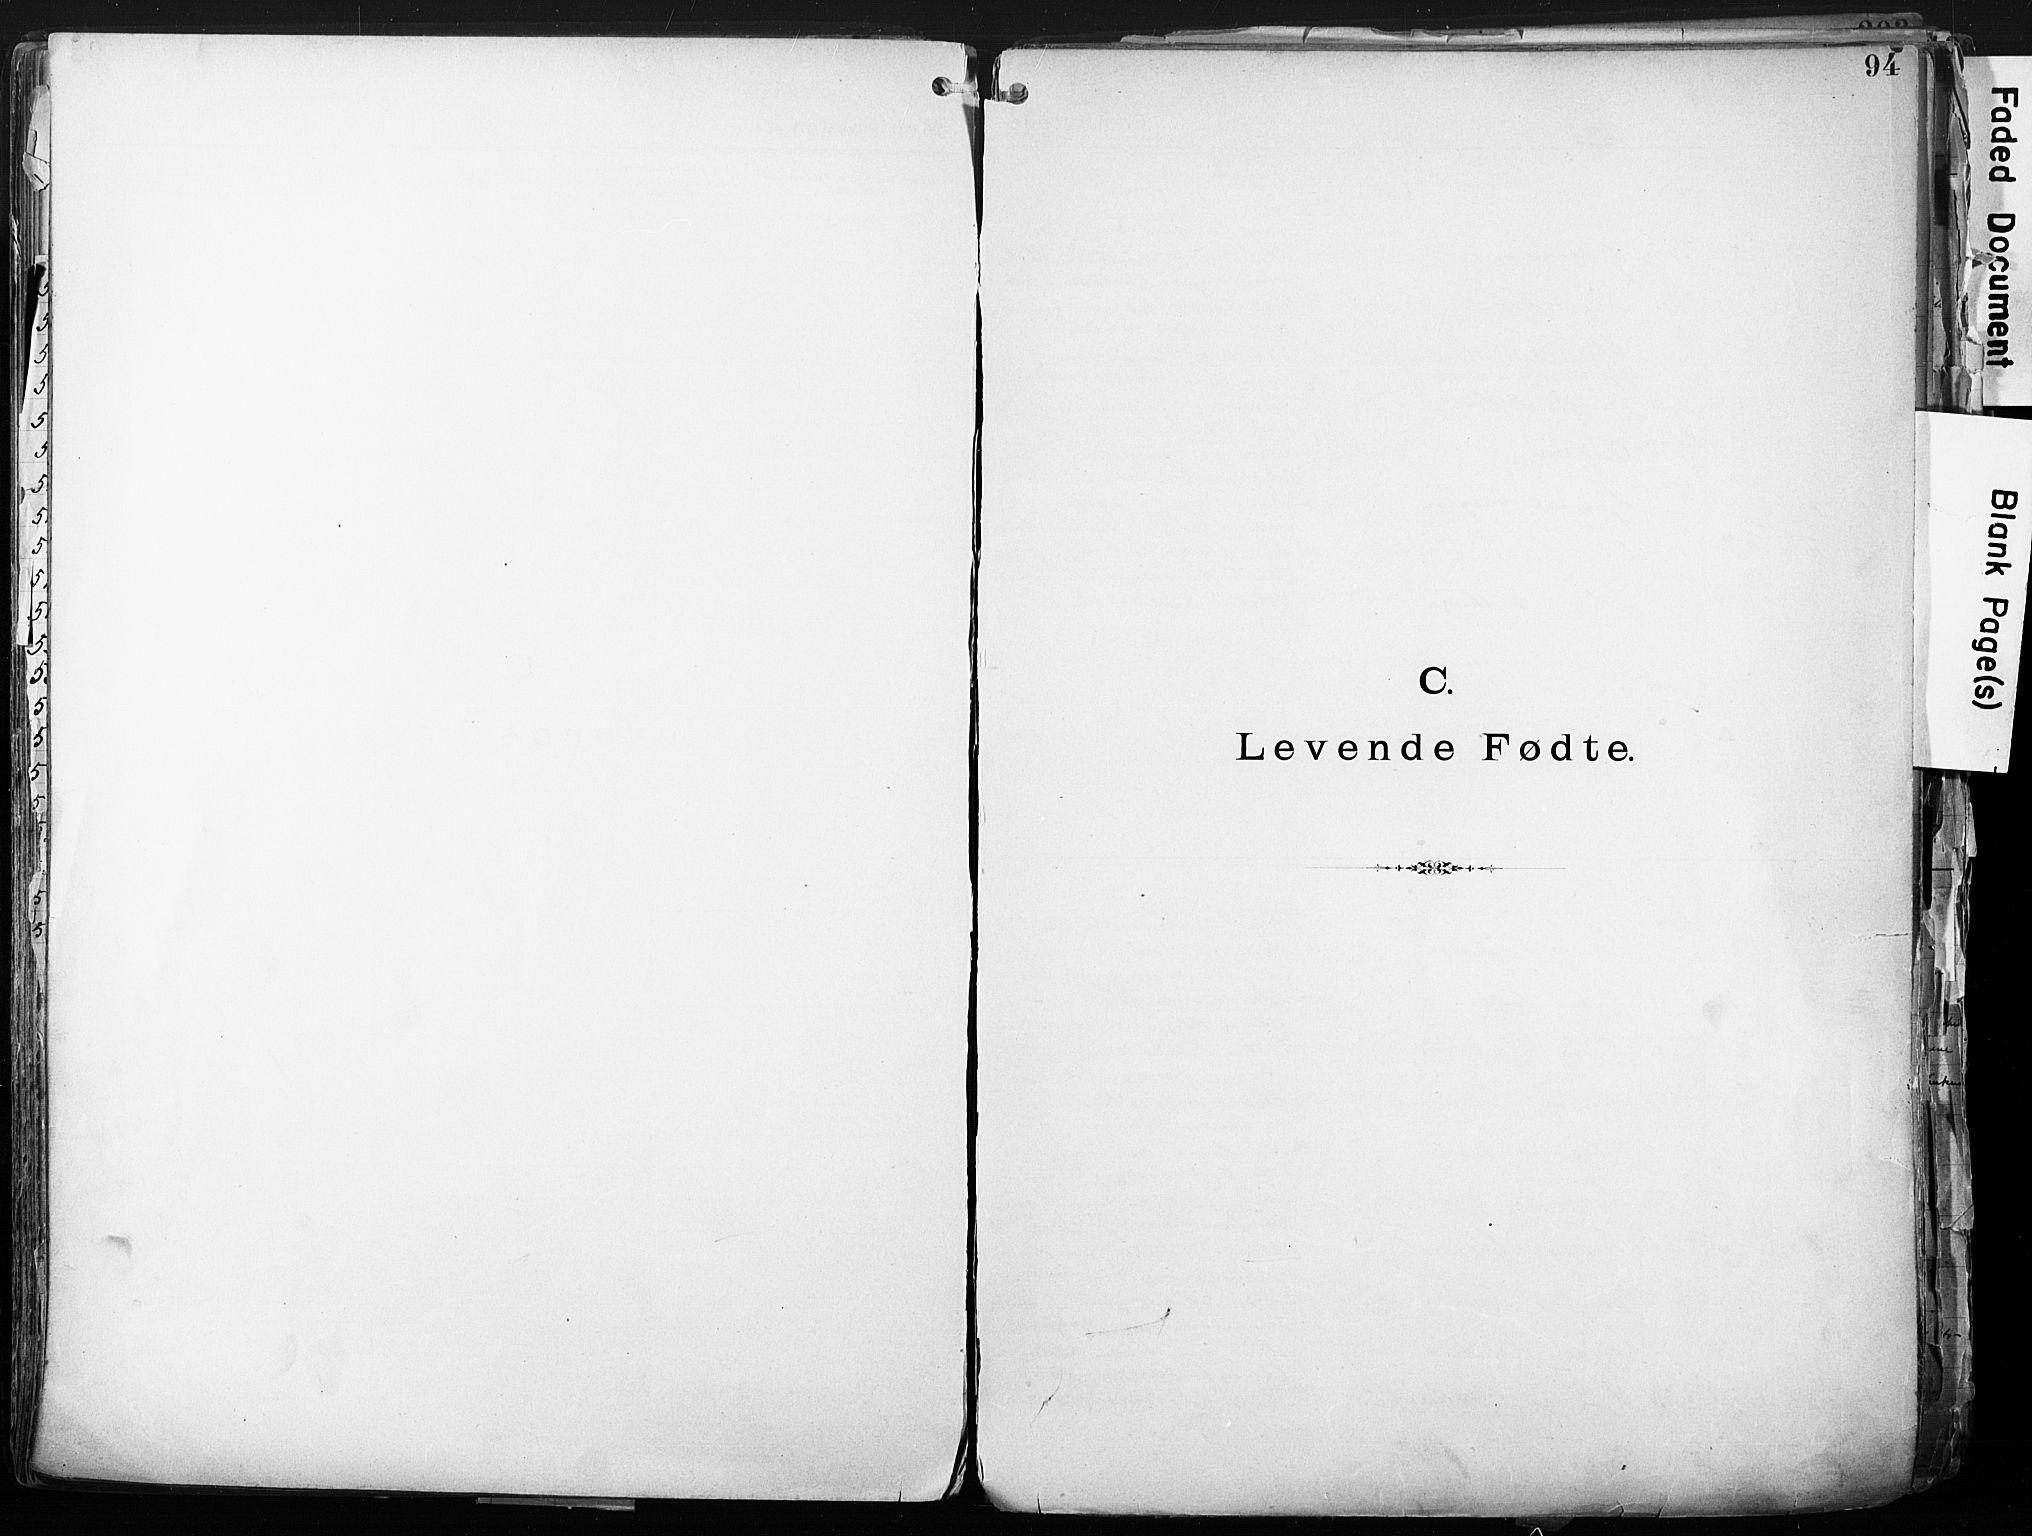 SAO, Sarpsborg metodistkirke, A/L0004: Dissenter register no. 4, 1892-1923, p. 94